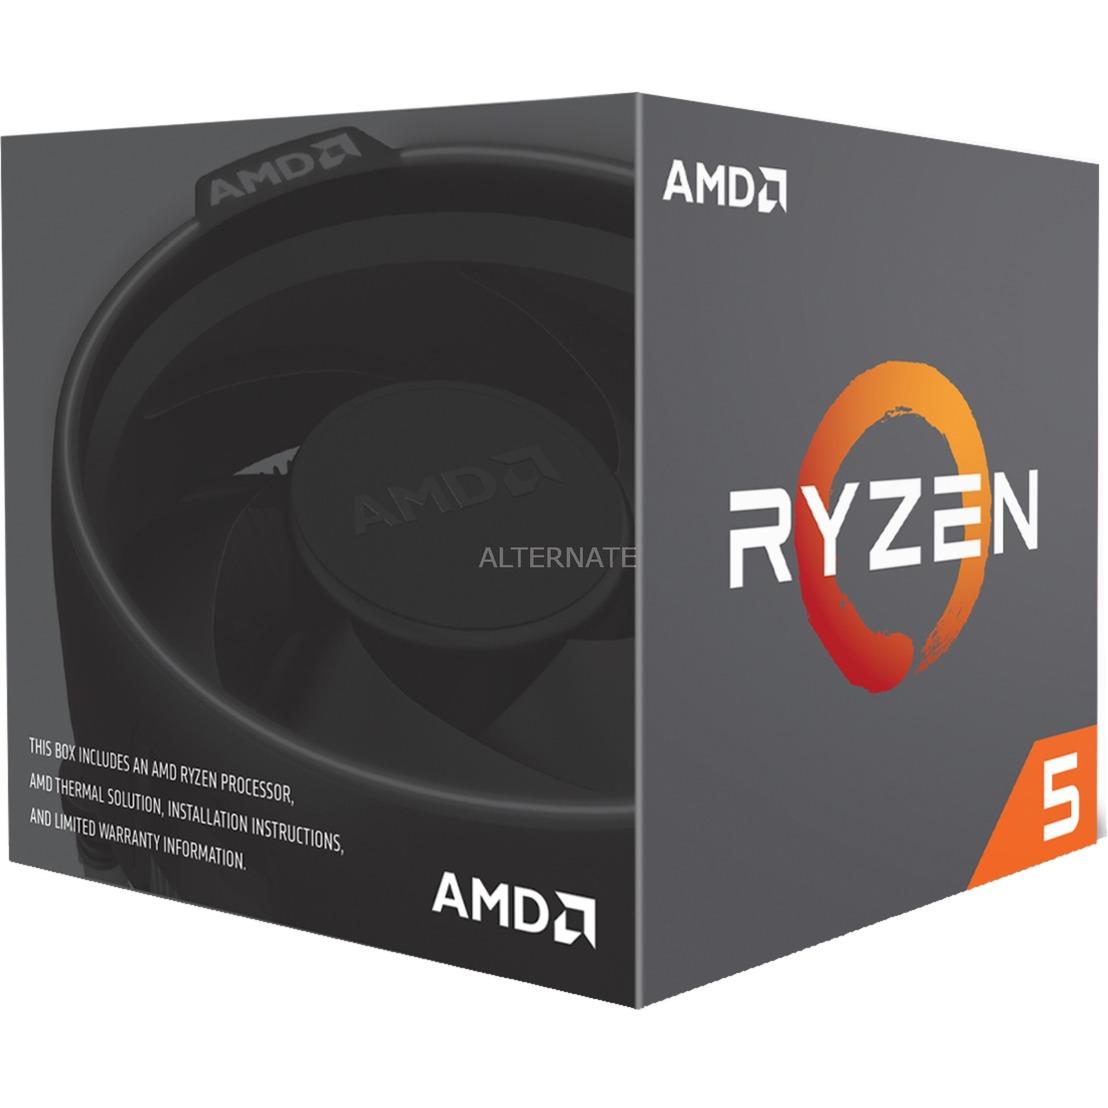 Ryzen 5 2600 procesador 3,4 GHz Caja 16 MB L3